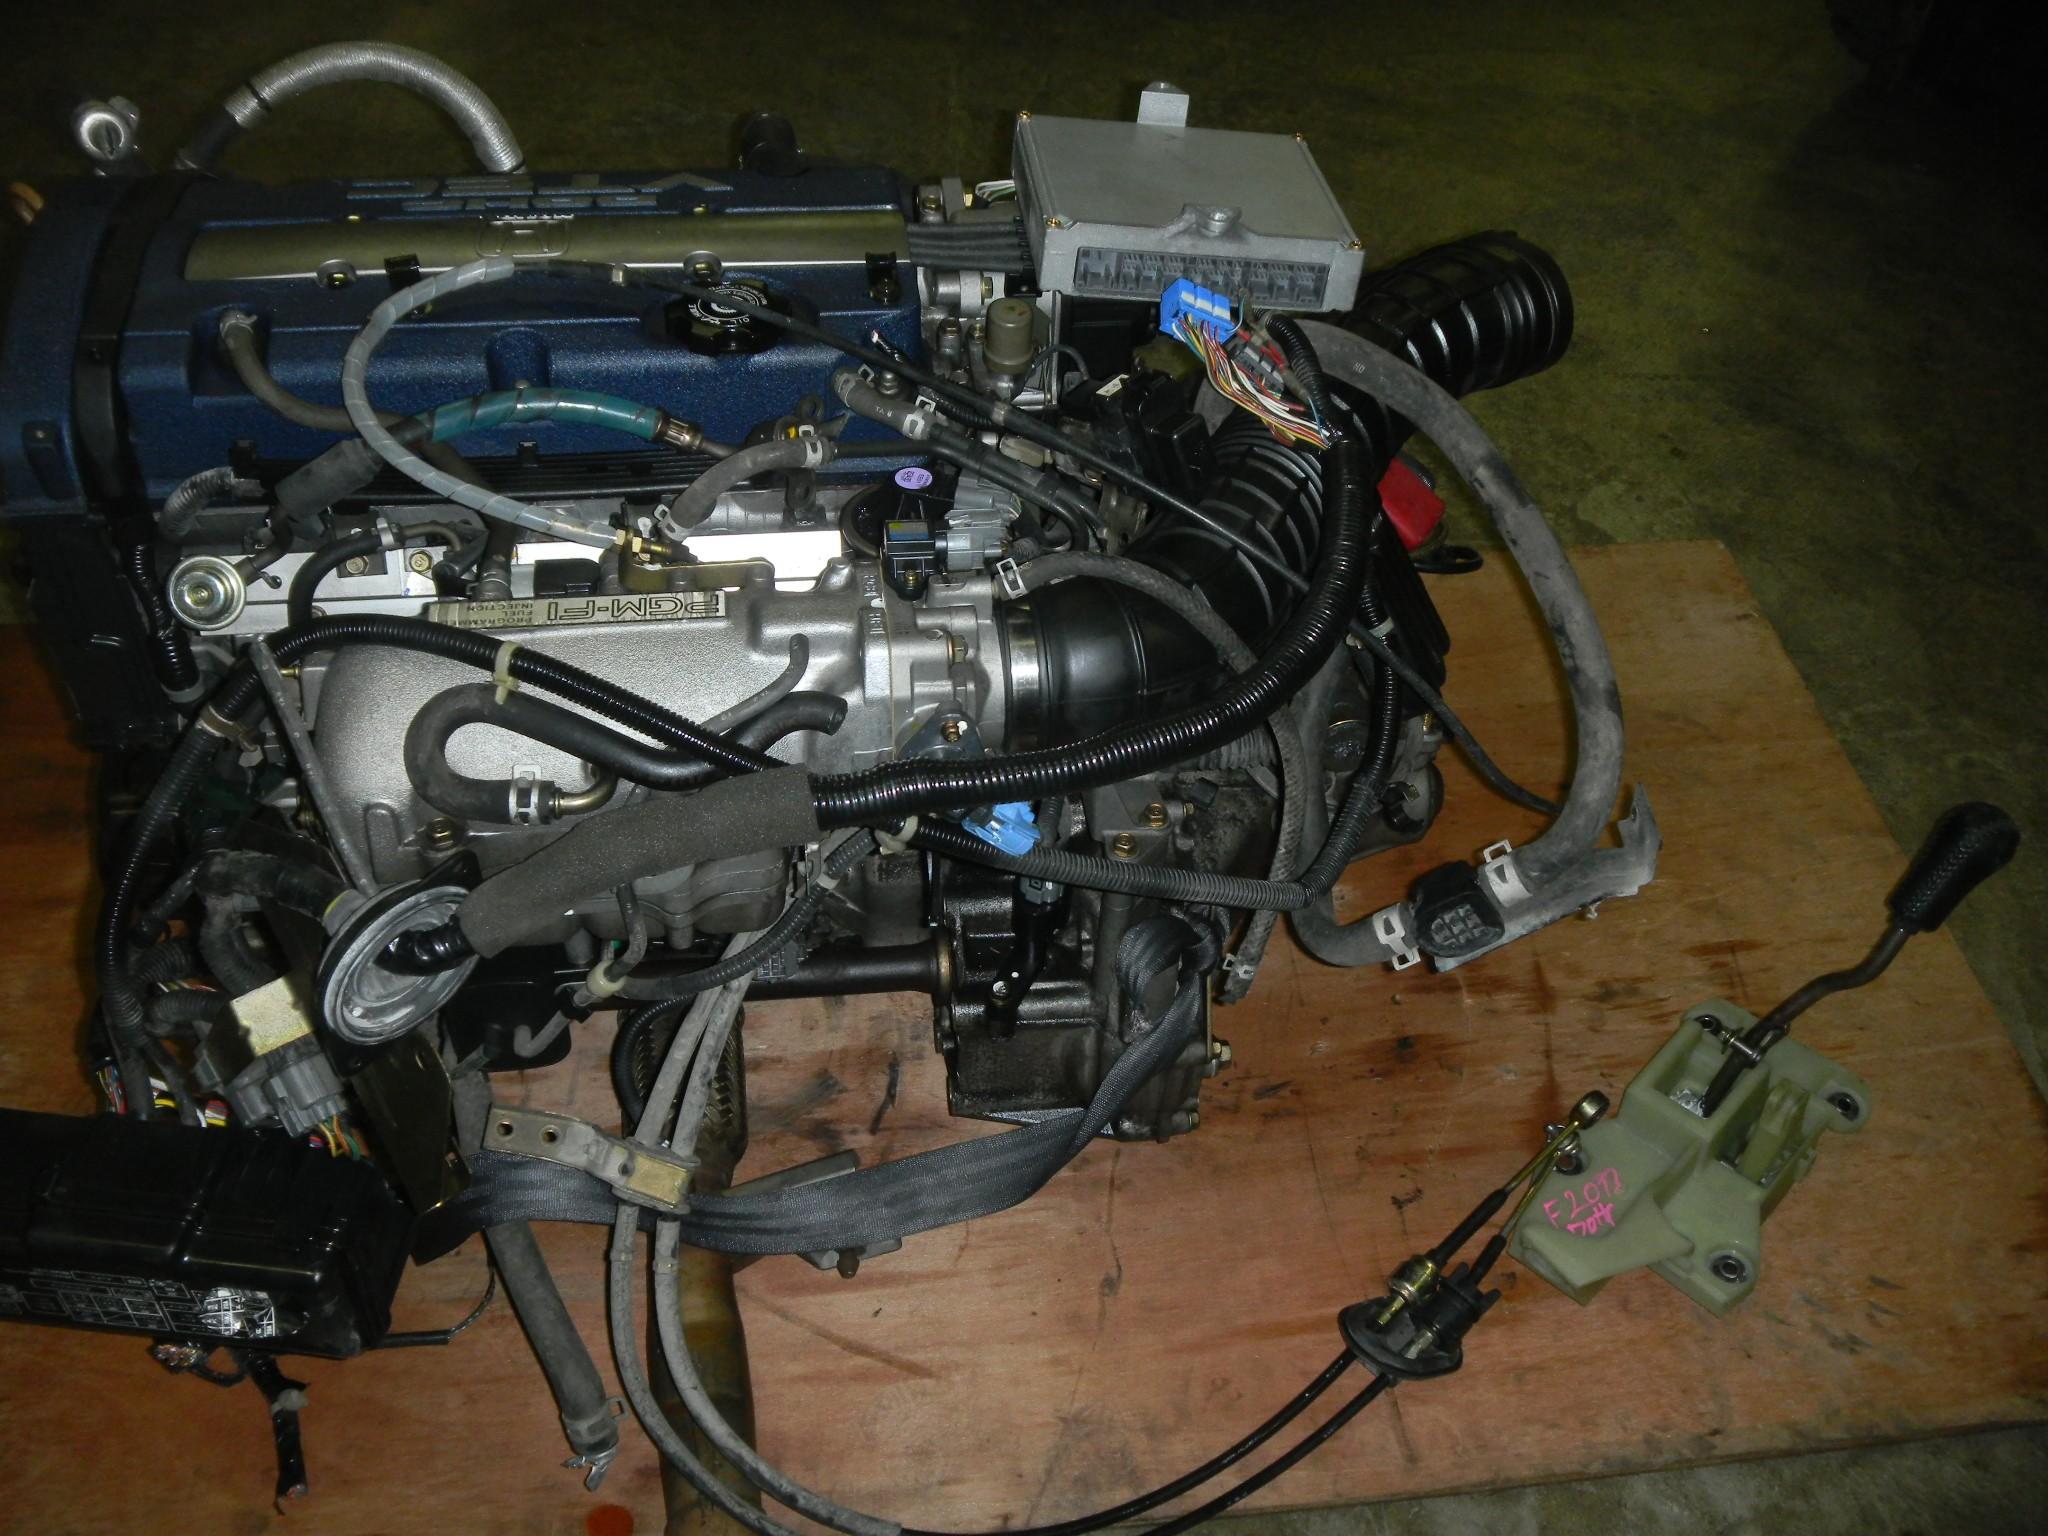 jdm honda accord f20b complete swap engine manual lsd